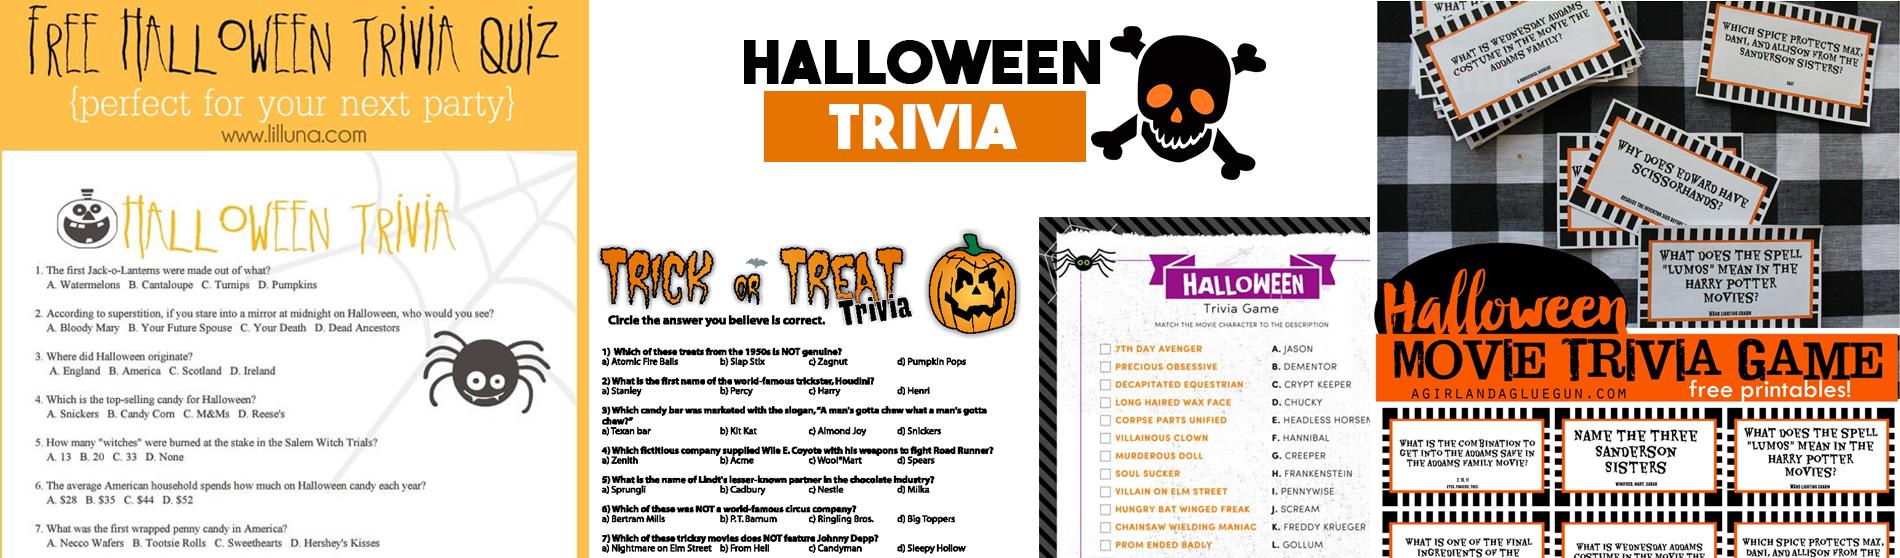 Halloween-Trivia